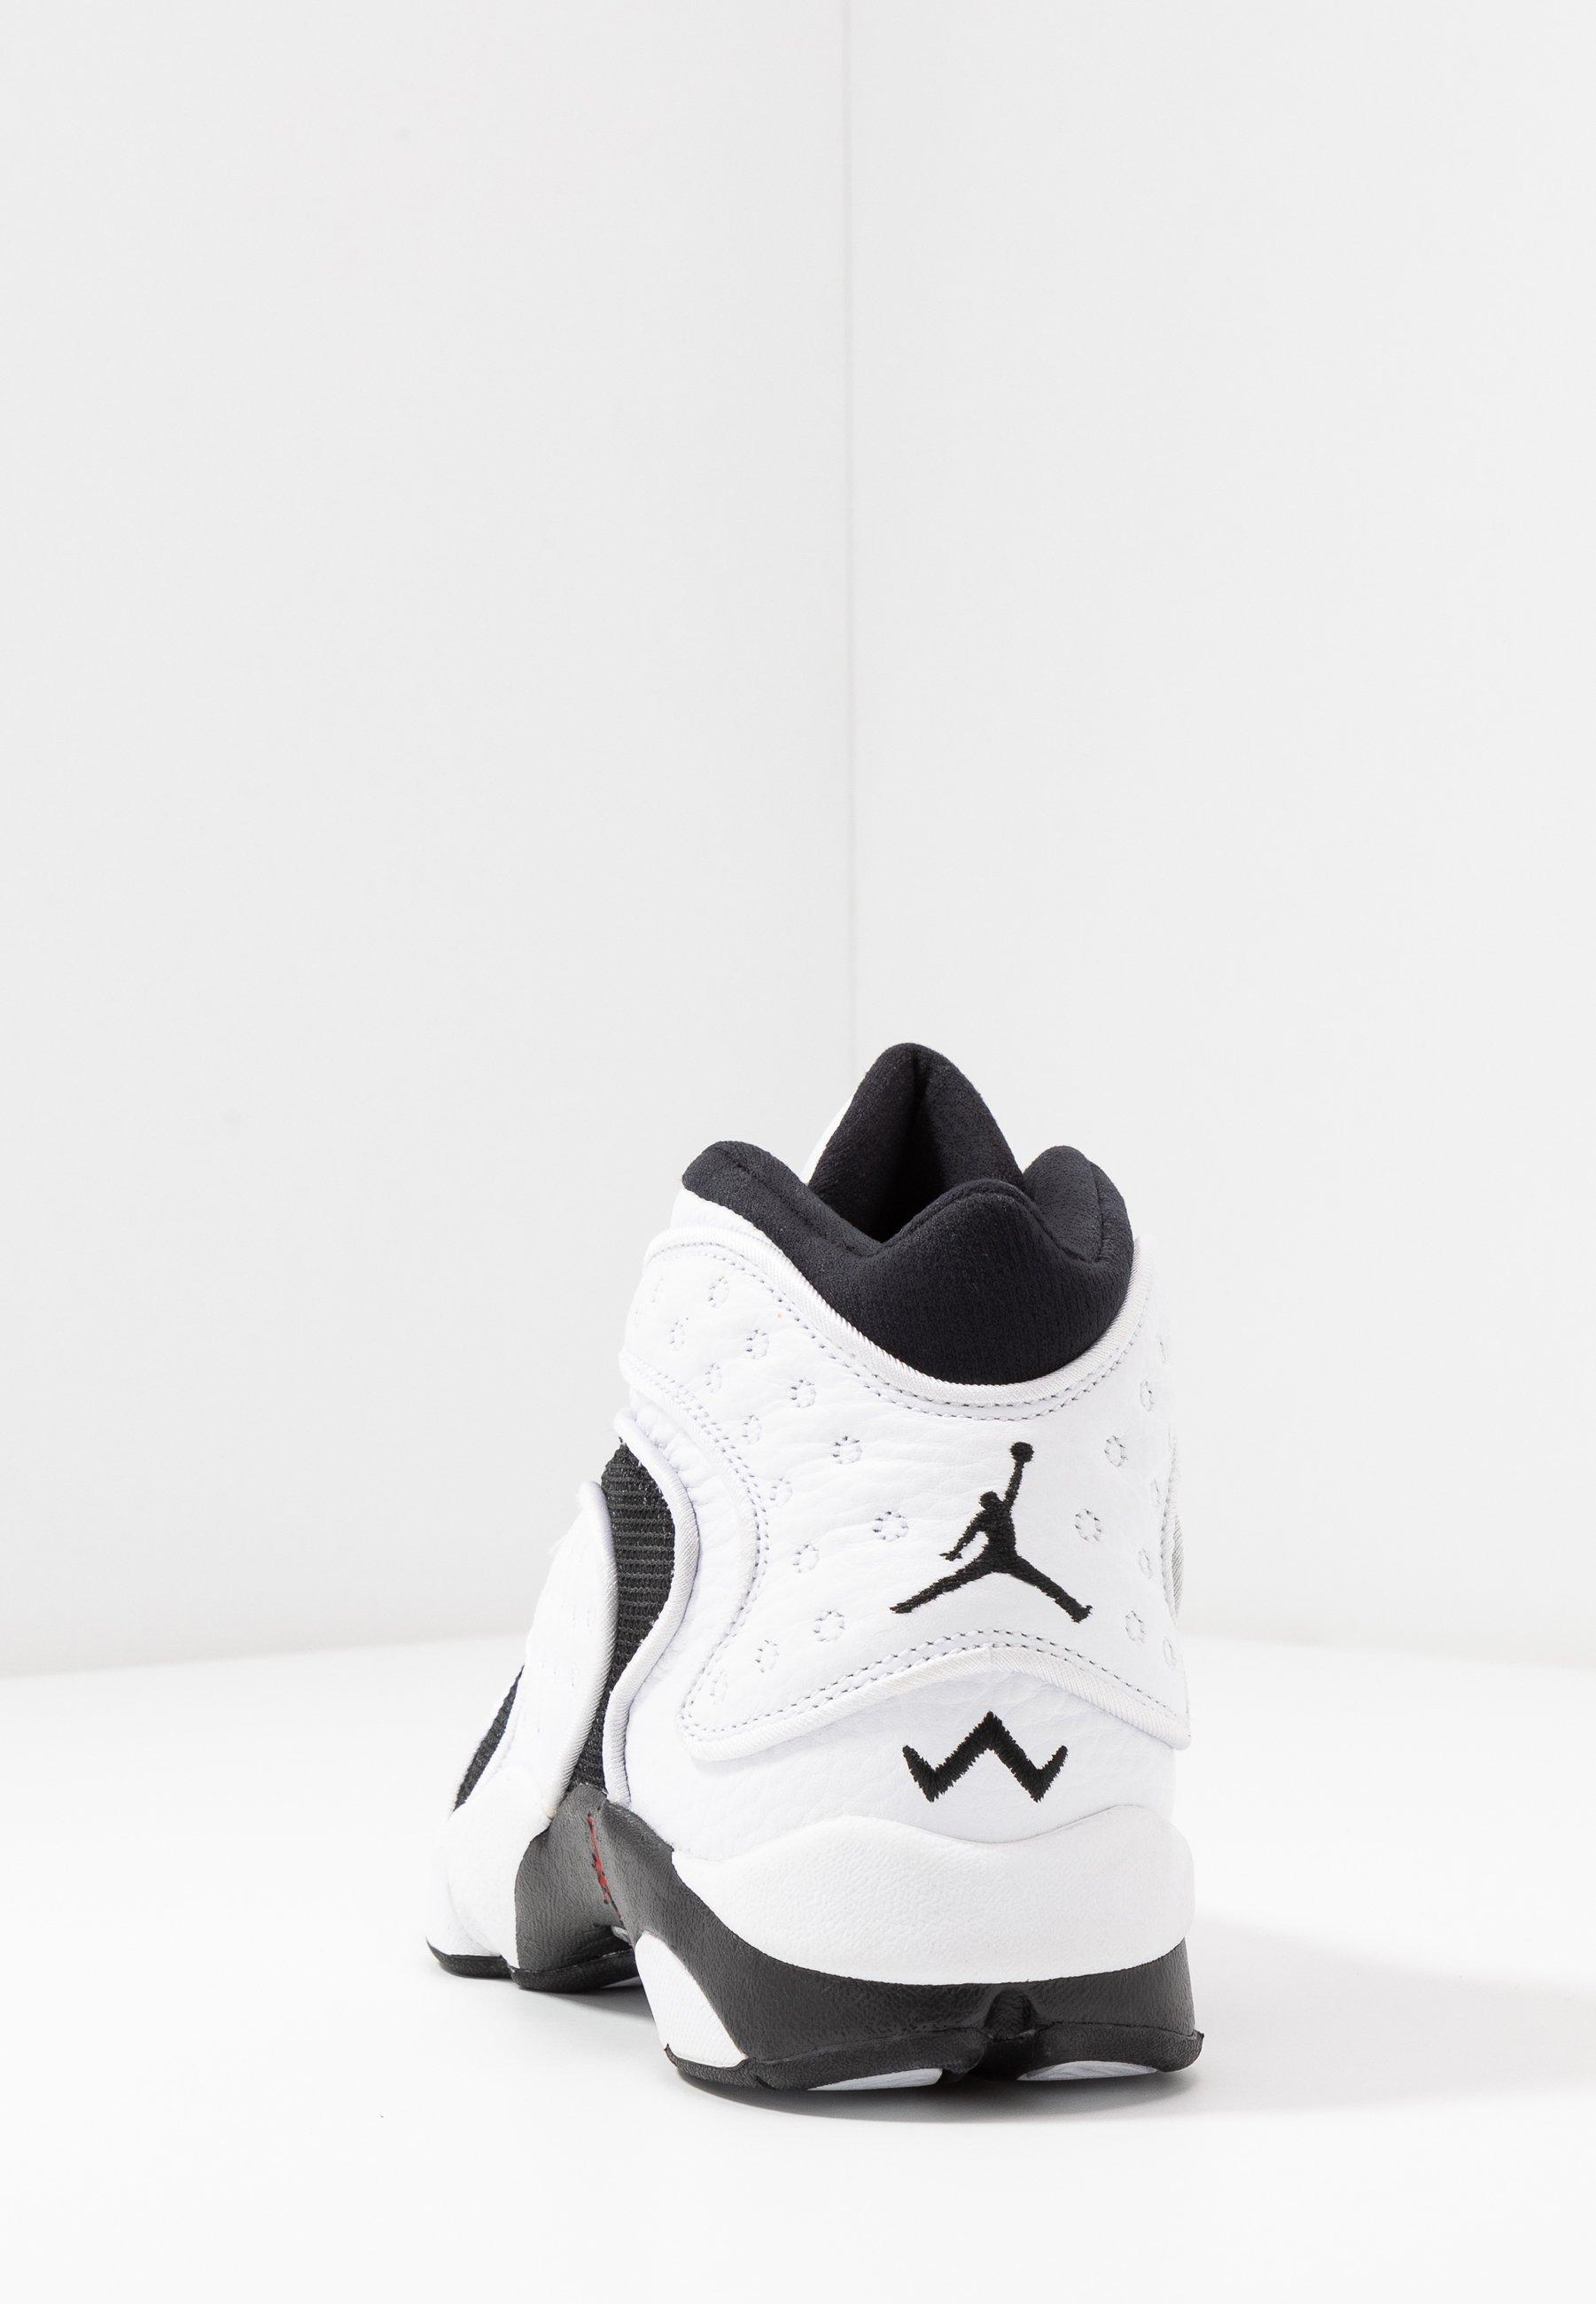 Jordan Air Jordan OG Damenschuh Høye joggesko white